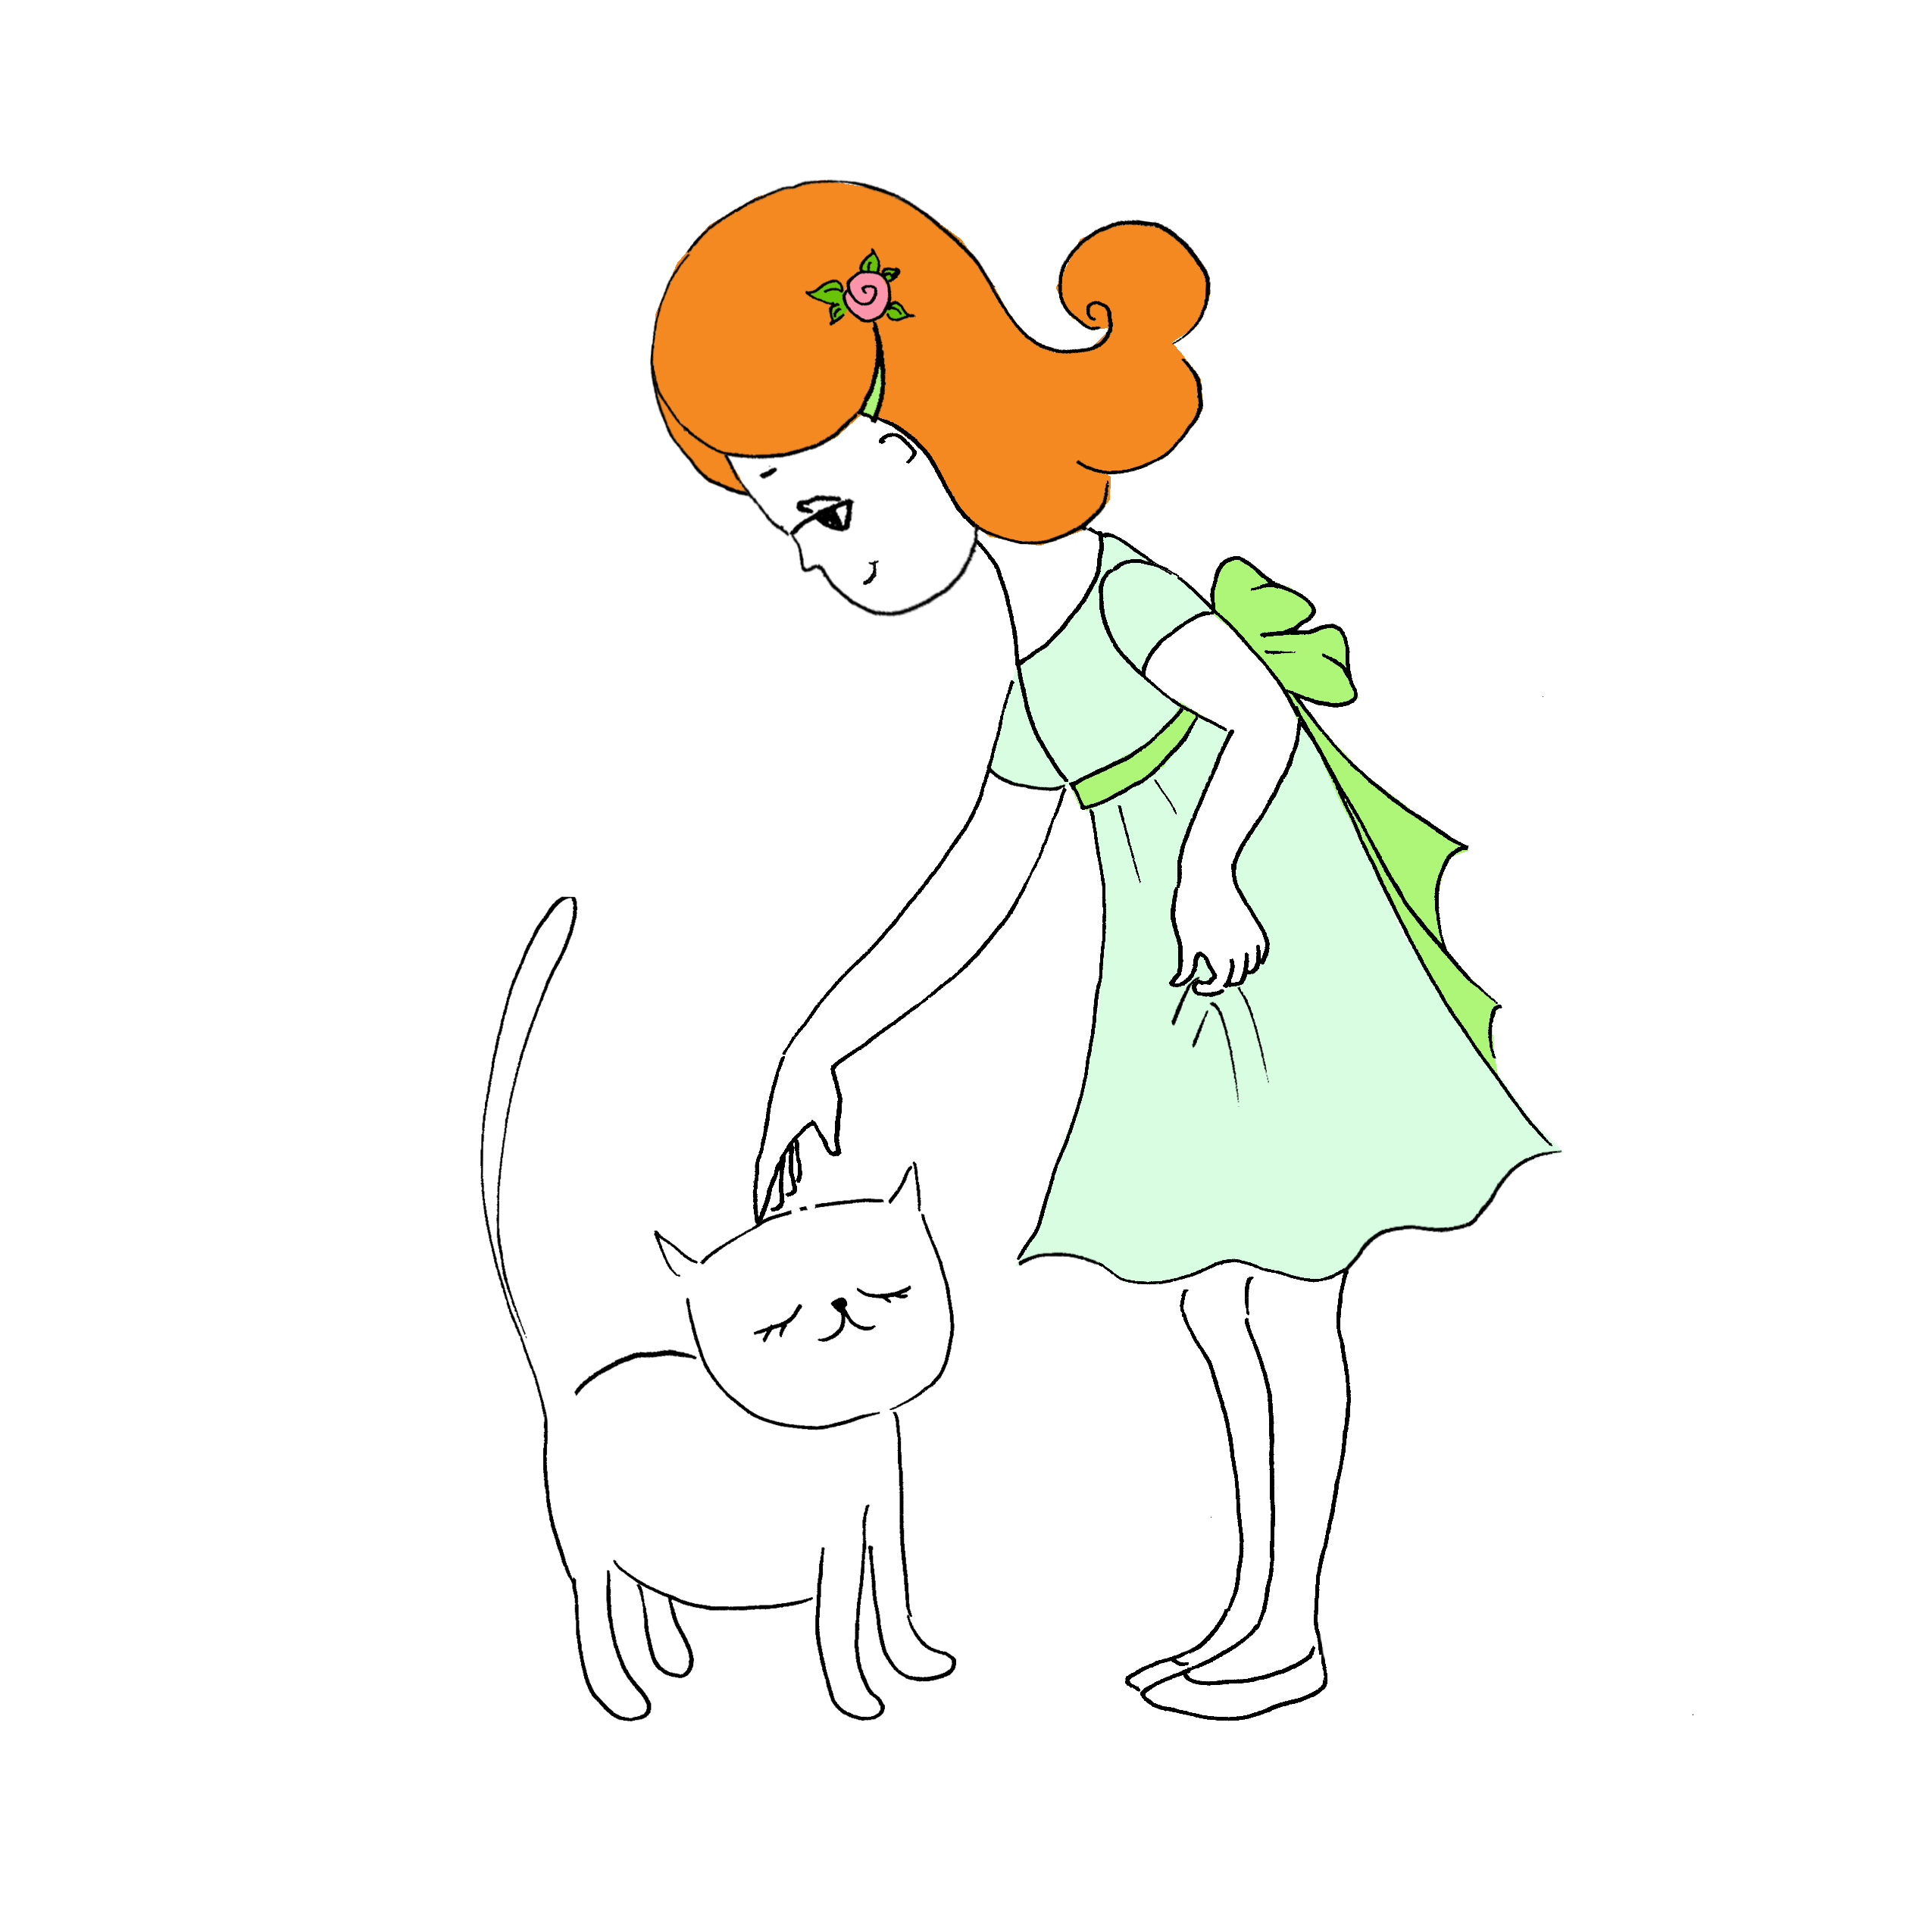 Мими&Китти – 11 – Мими идет на день рождения by Irena Brodeski - Illustrated by Irena Brodeski - Ourboox.com